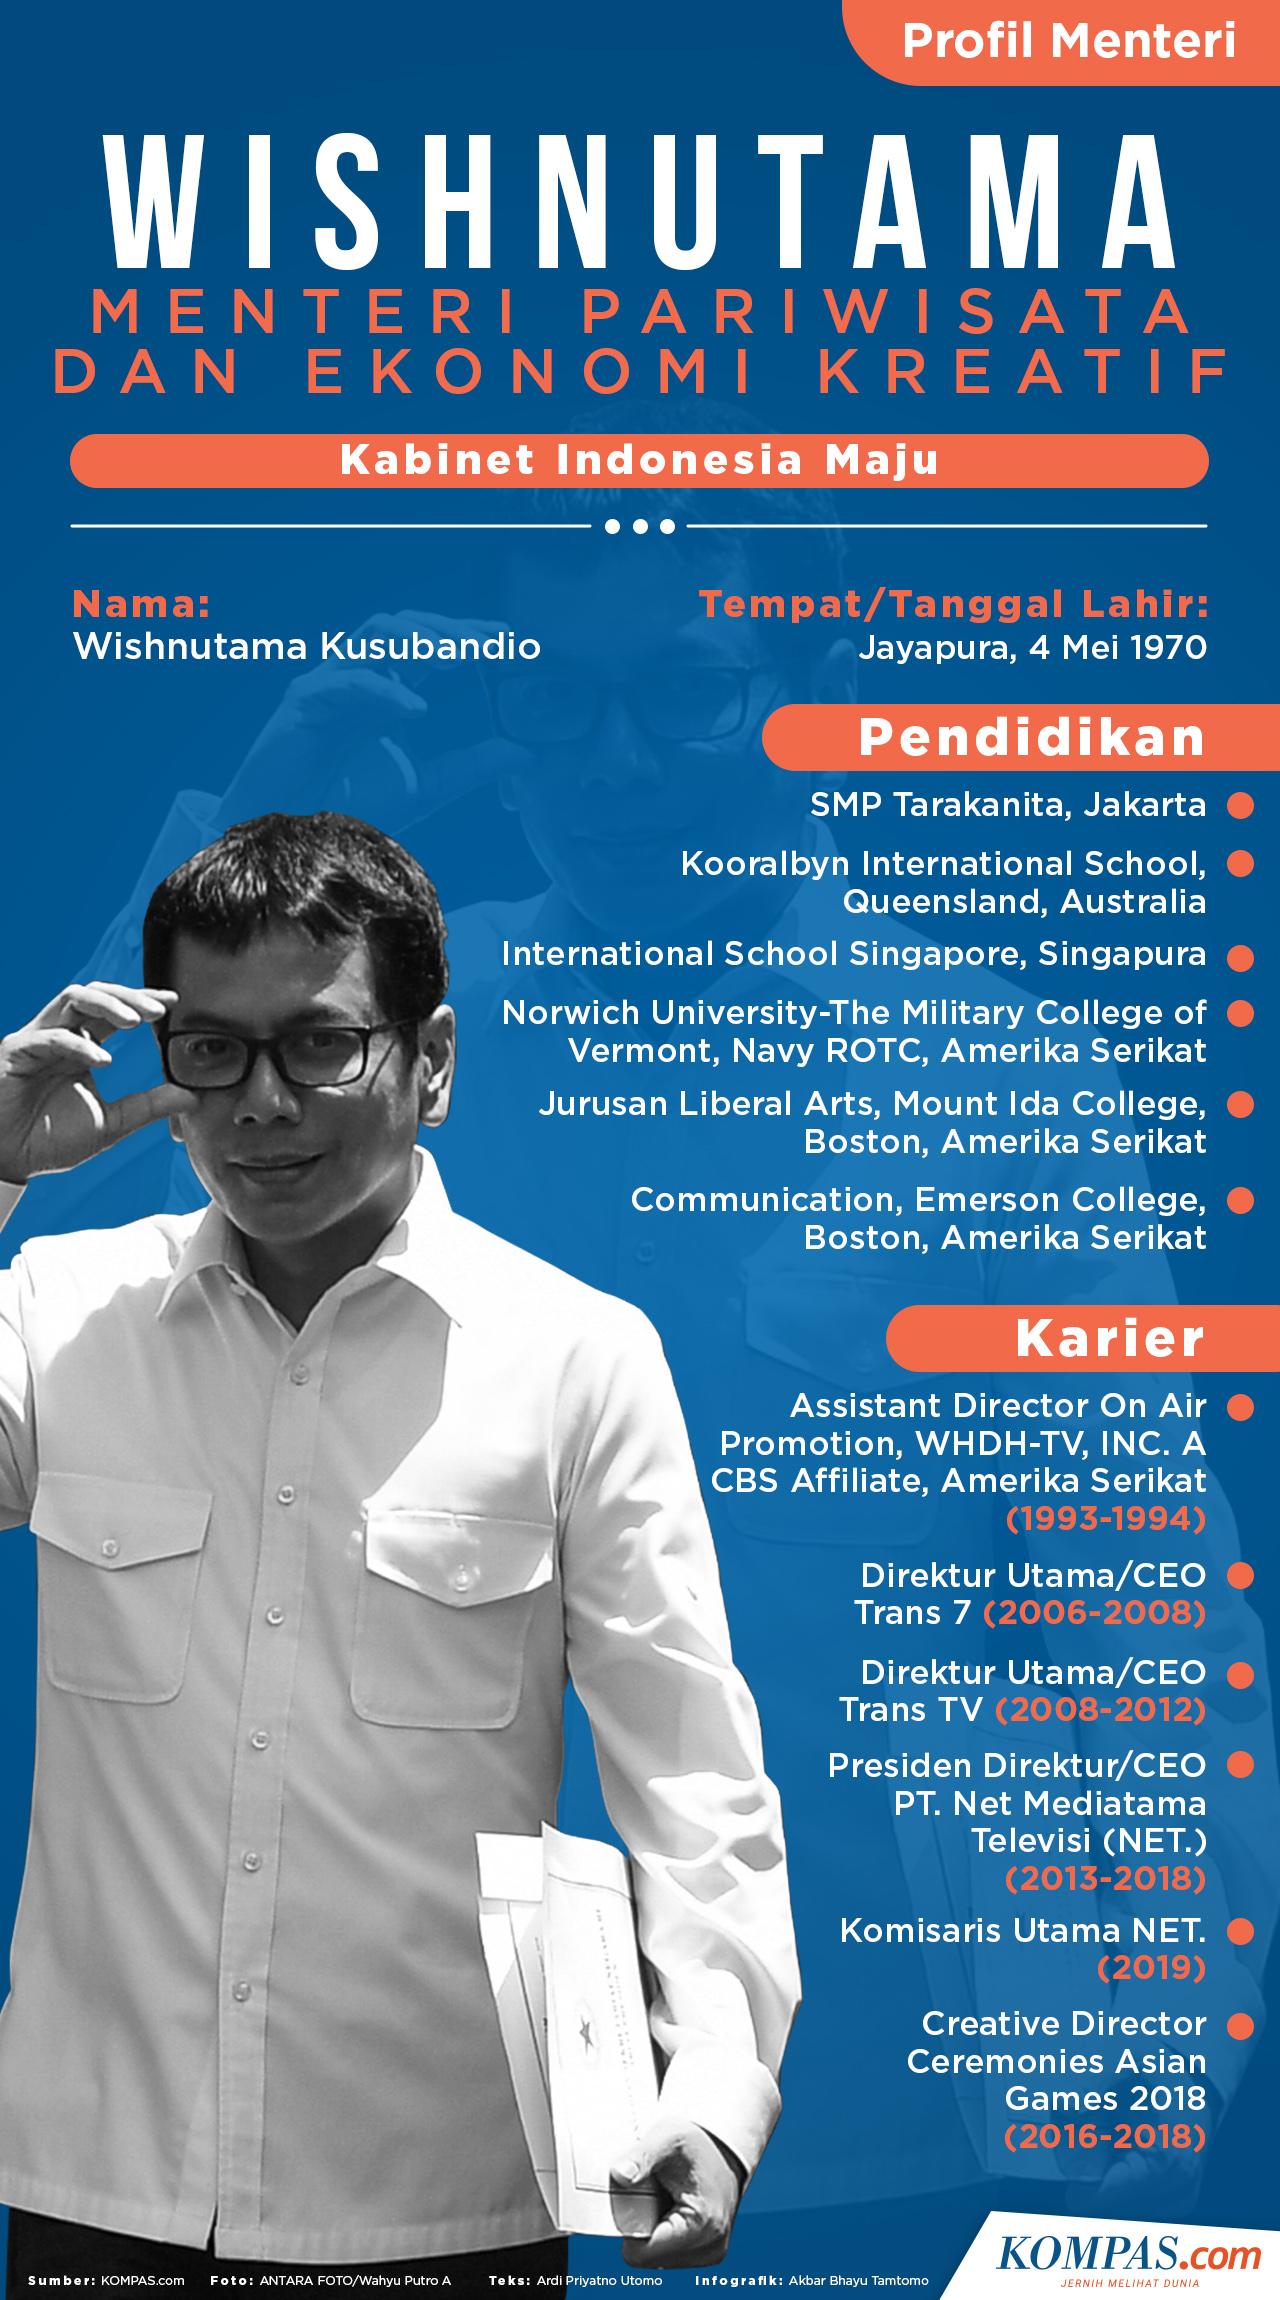 INFOGRAFIK] Profil Wishnutama, Menteri Pariwisata dan Ekonomi Kreatif